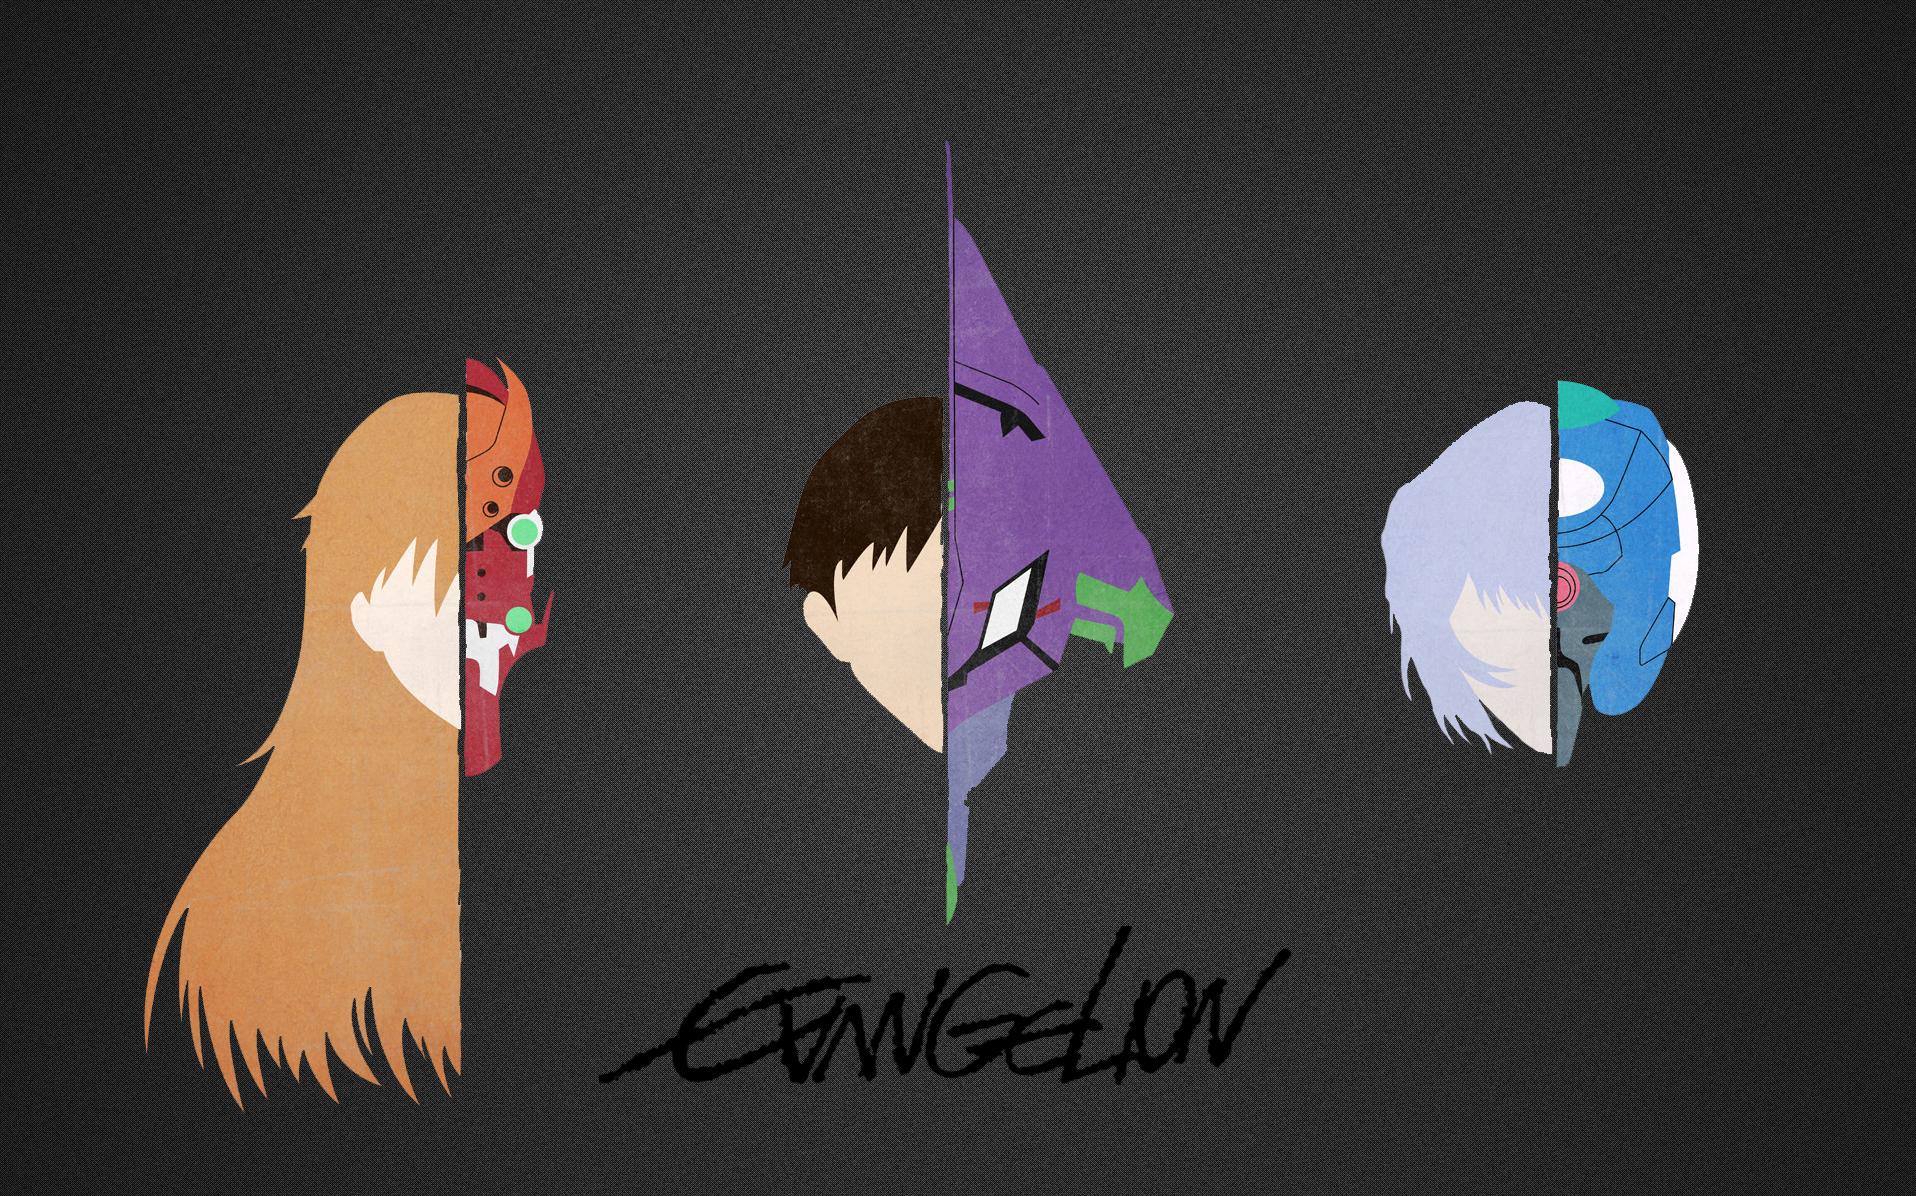 evangelion wallpaper hd anime - photo #14